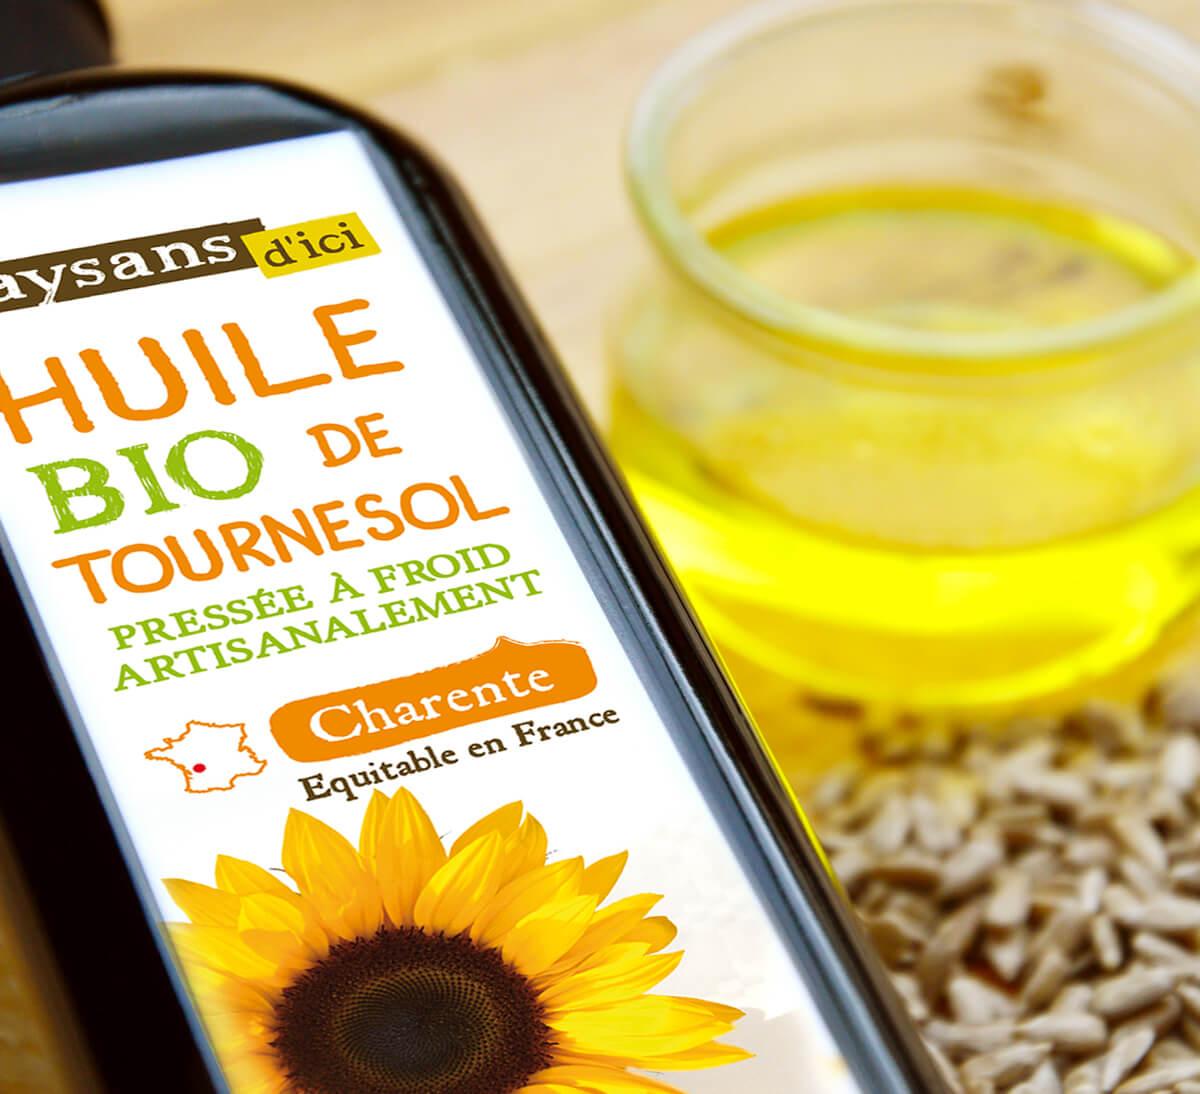 huile-tournesol-bio-equitable-paysansdici